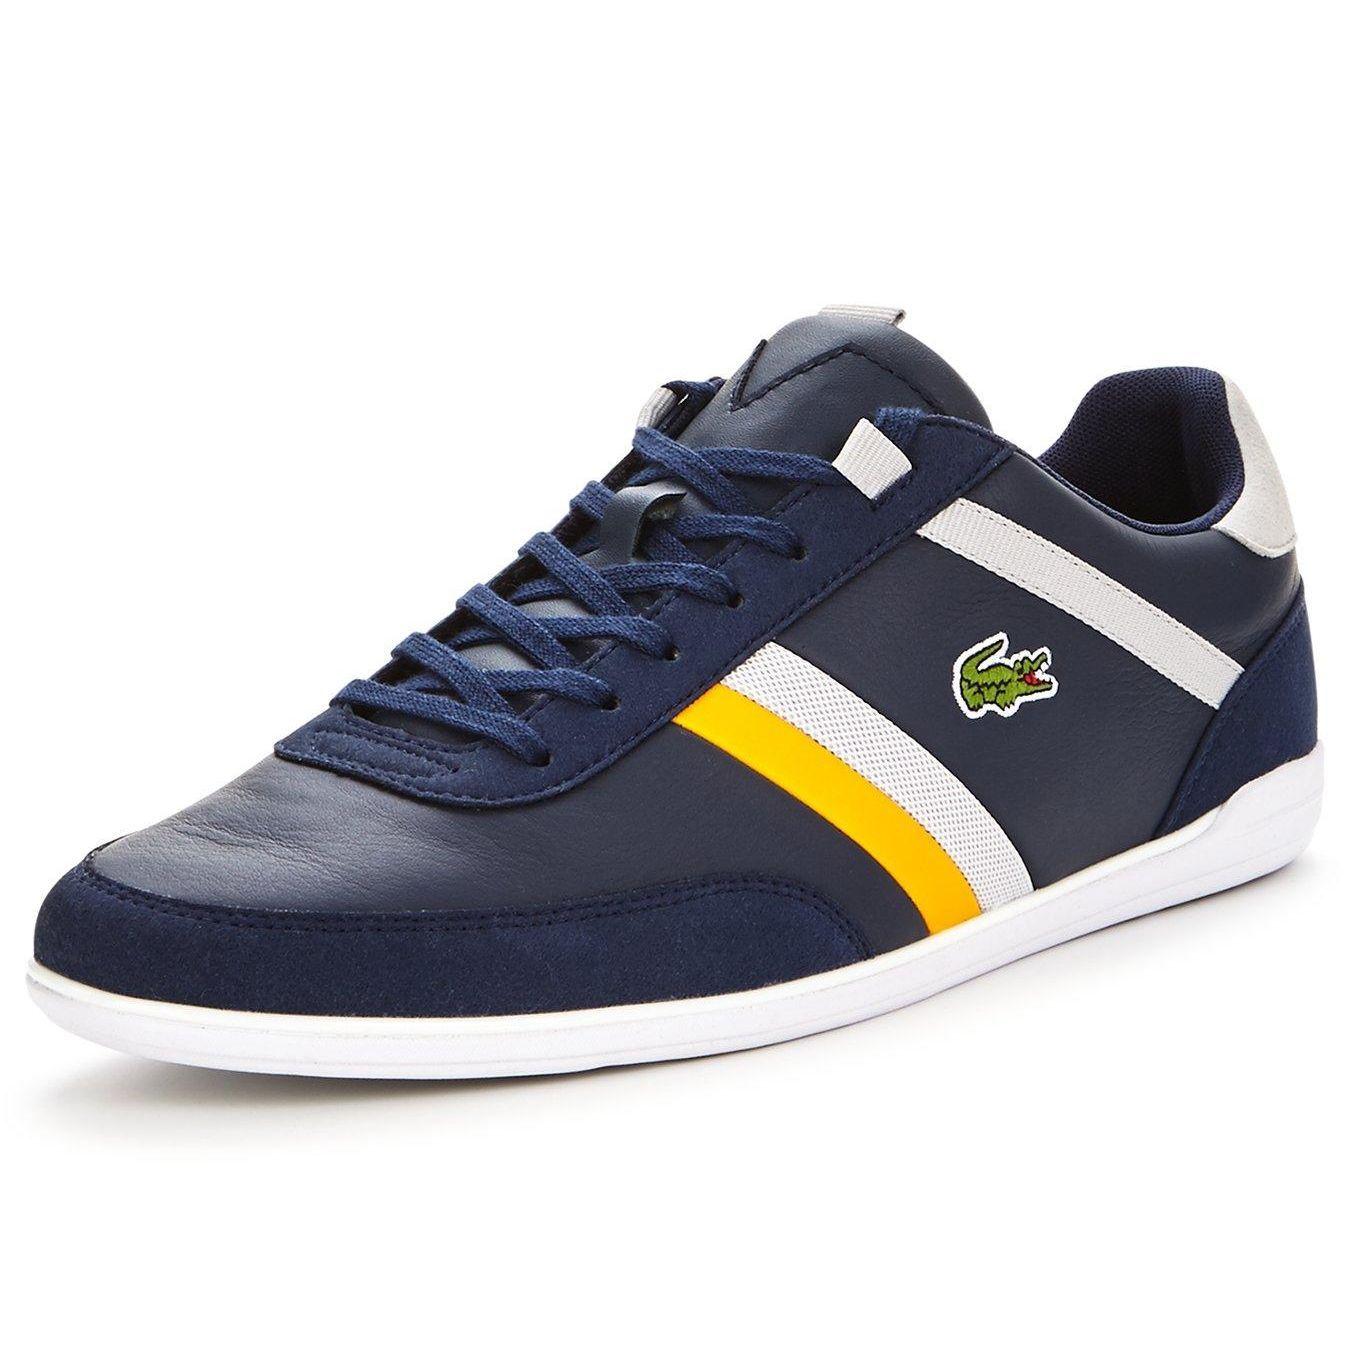 Buty Meskie Lacoste Giron 117 1 Nv 40 5 46 Nowosc 6769982293 Oficjalne Archiwum Allegro Lacoste Dc Sneaker Sneakers